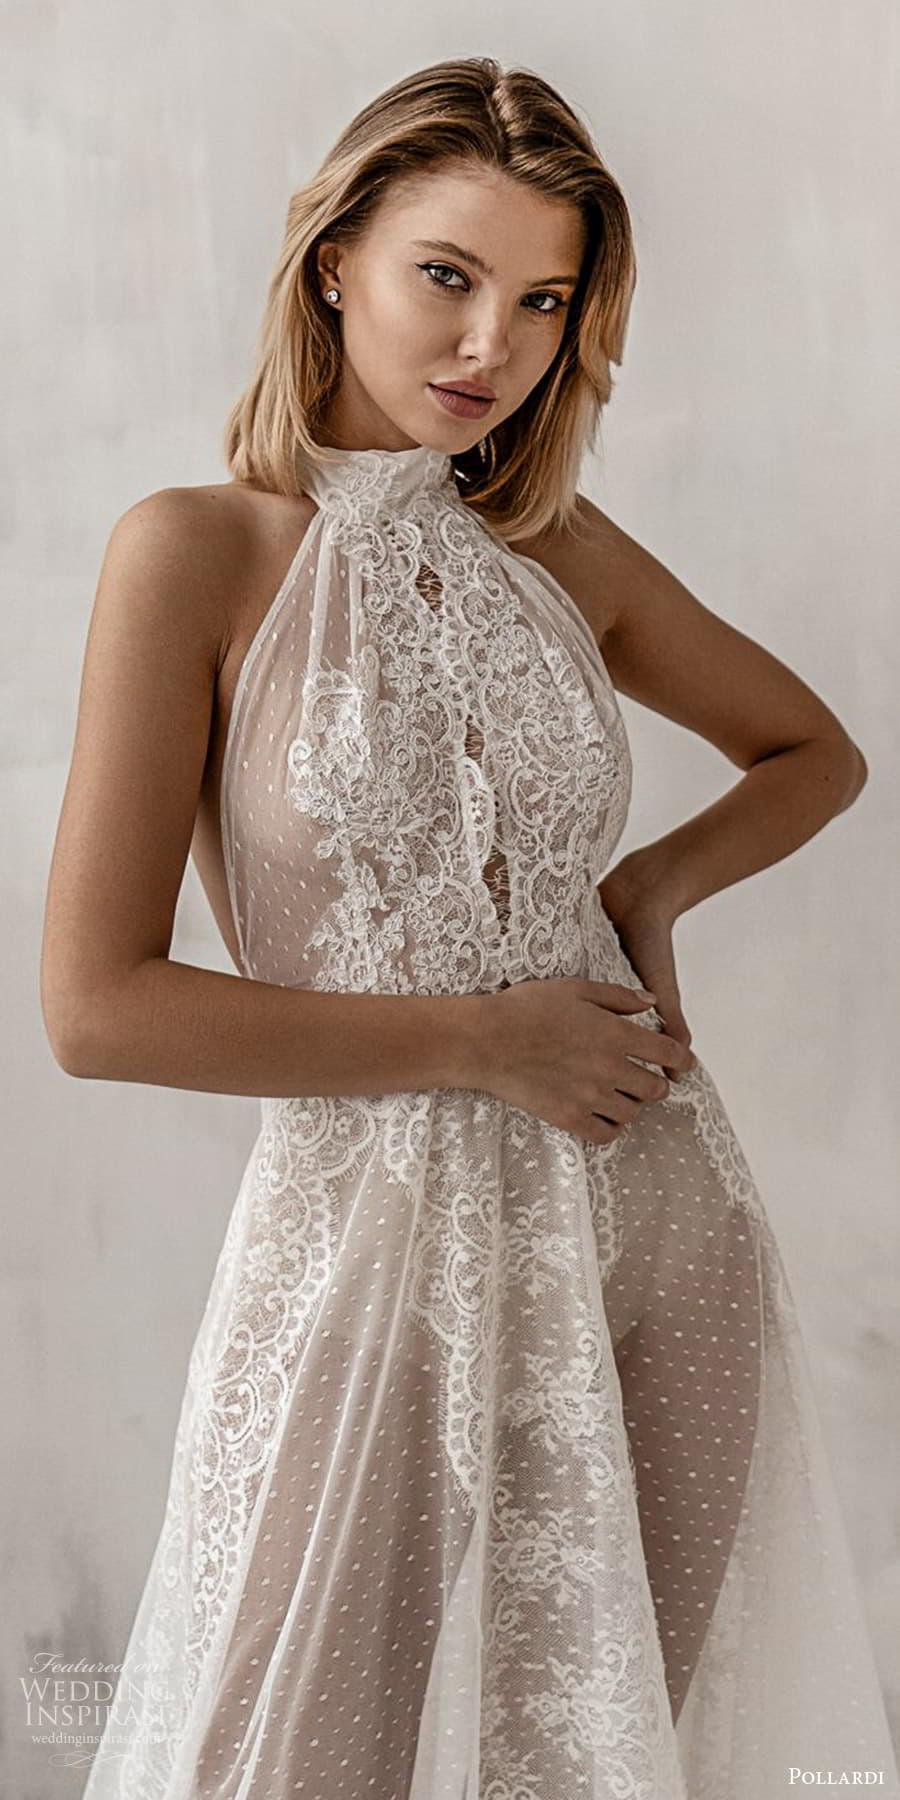 pollardi 2021 boudoir bridal sleeveless halter neckline bridal over dress (6) zv